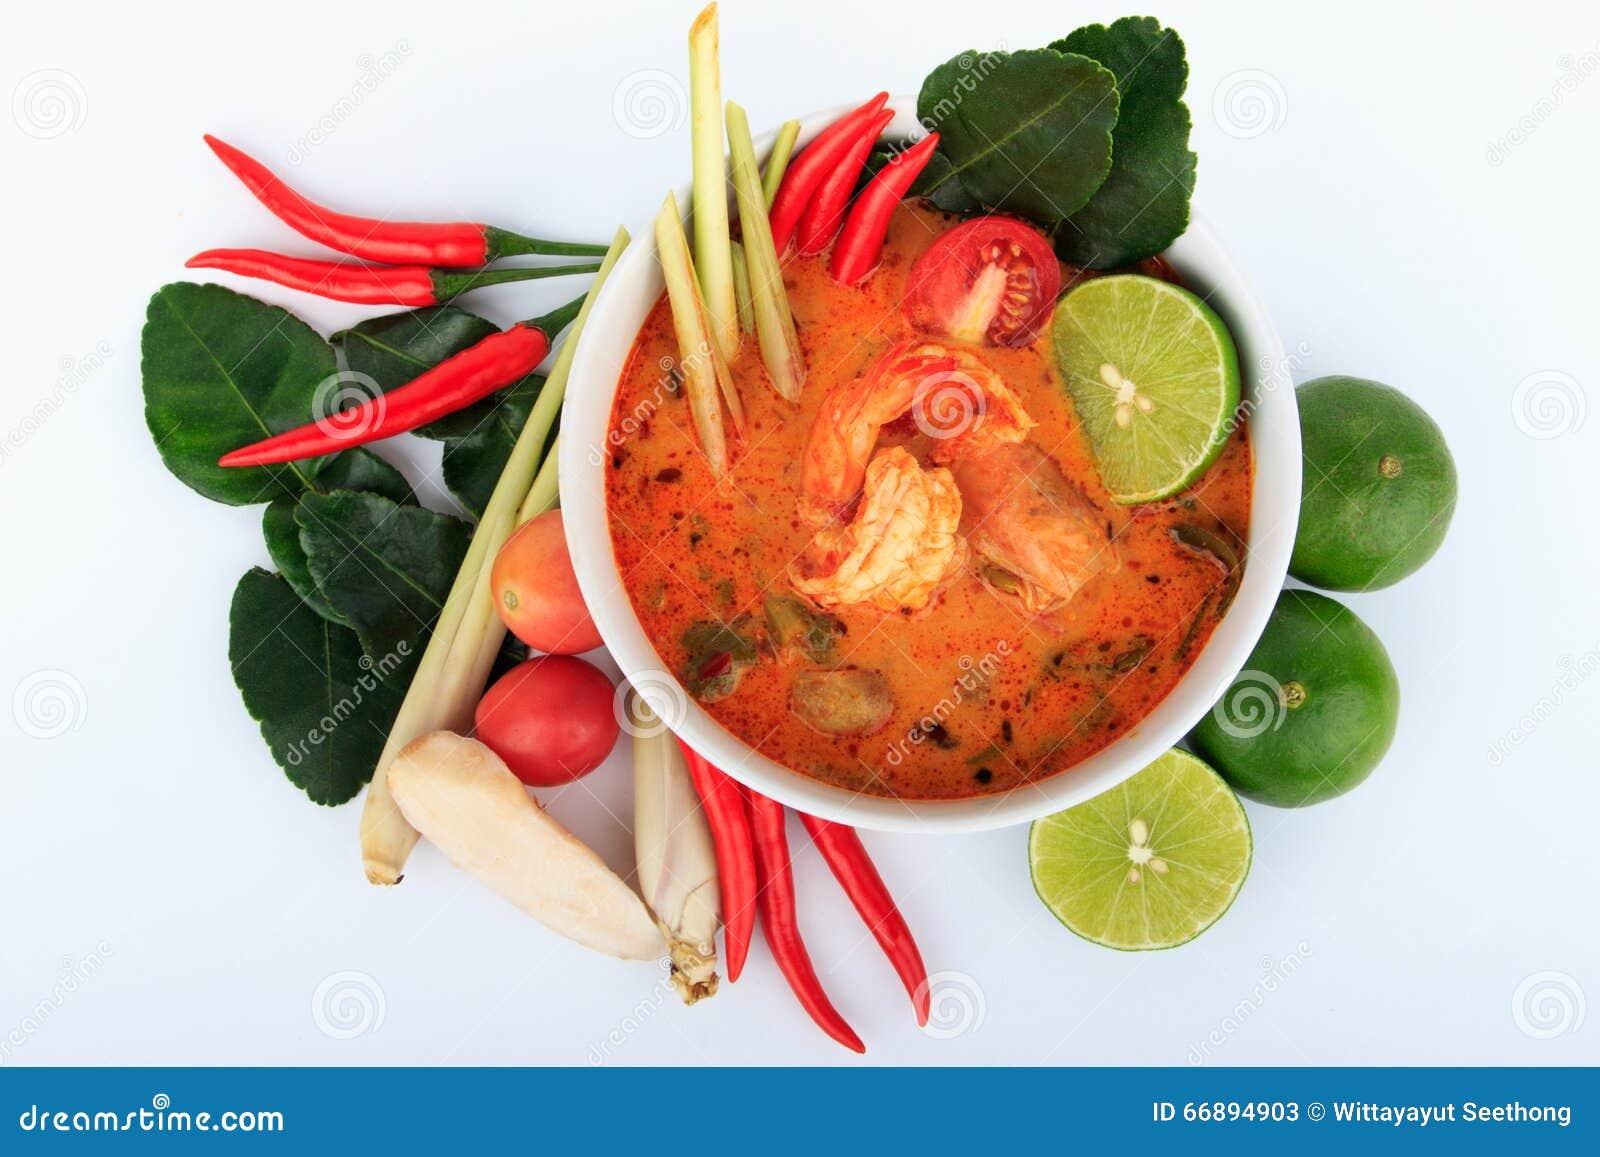 Thai Prawn Soup with Lemongrass (Tom Yum Goong) on White Background.